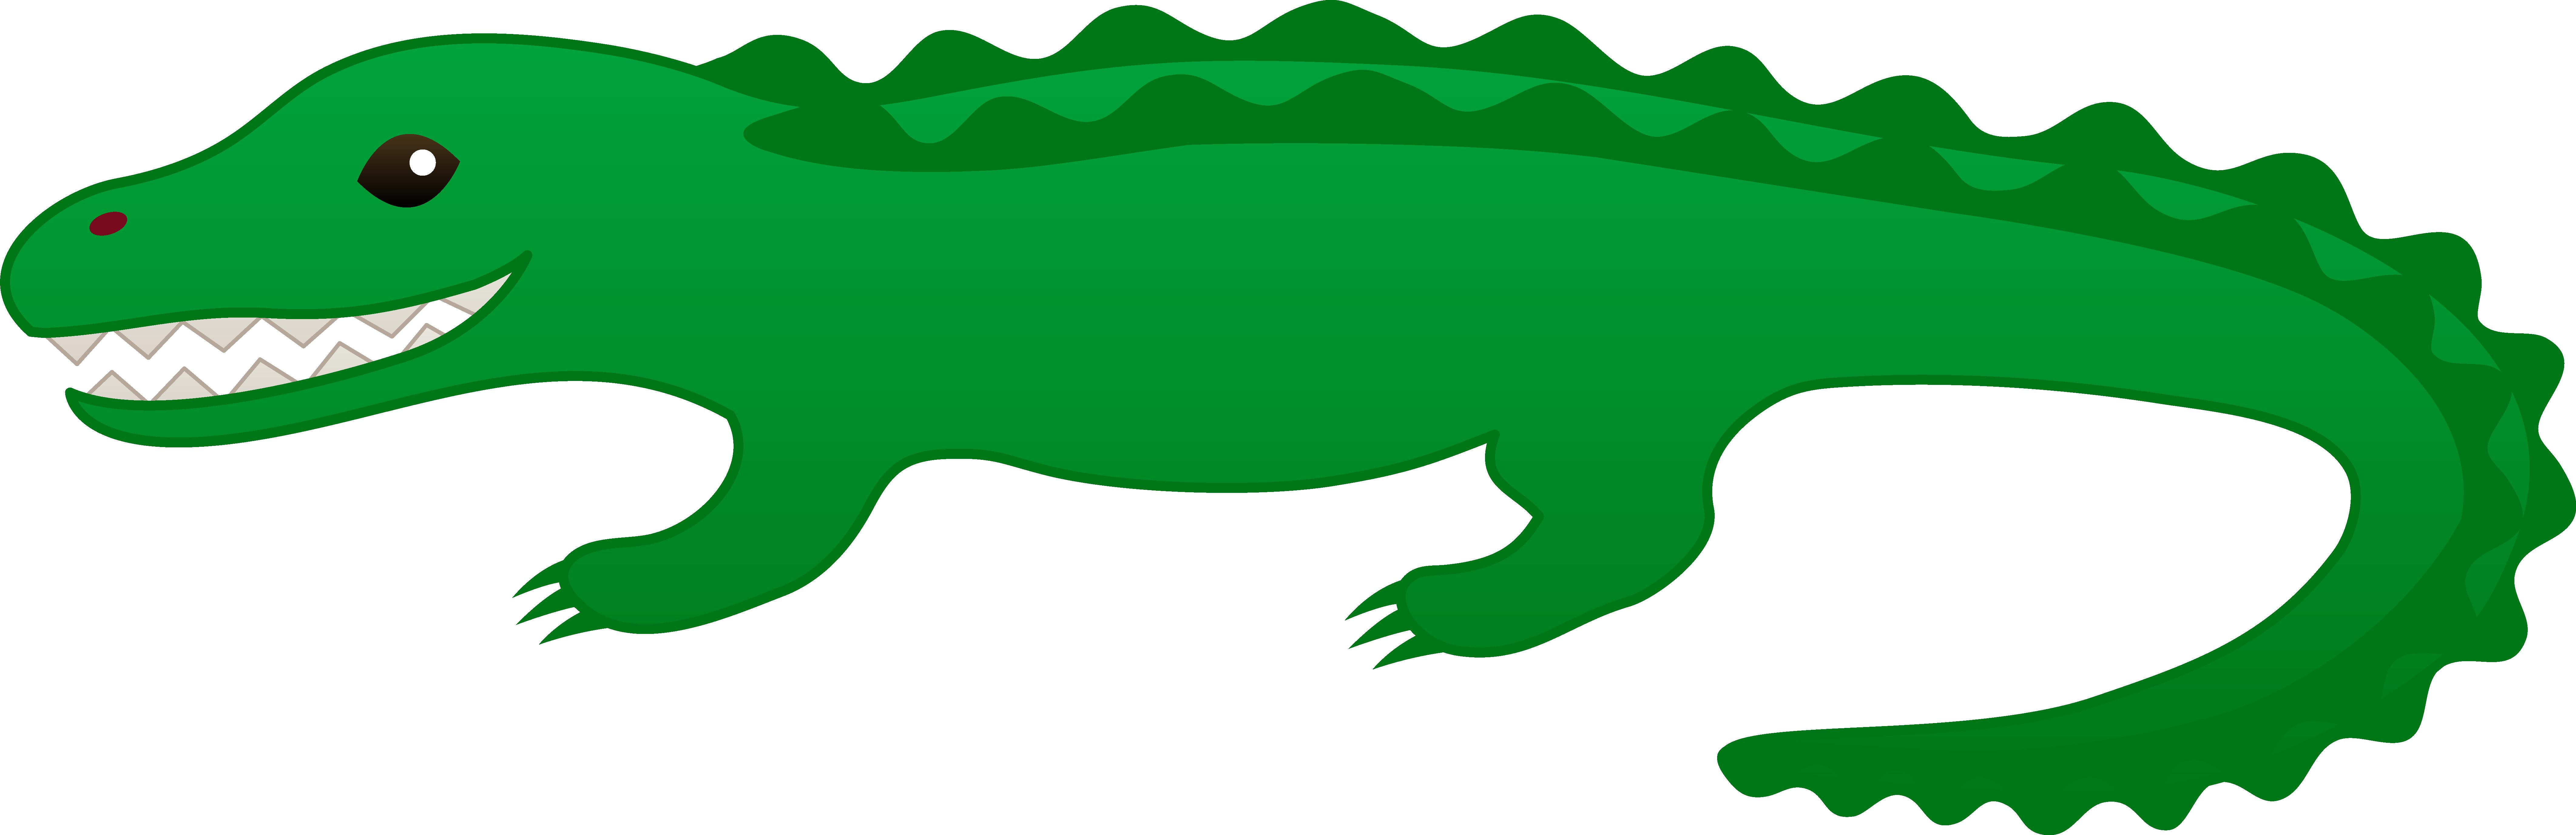 8491x2753 Animated Alligator Clip Art